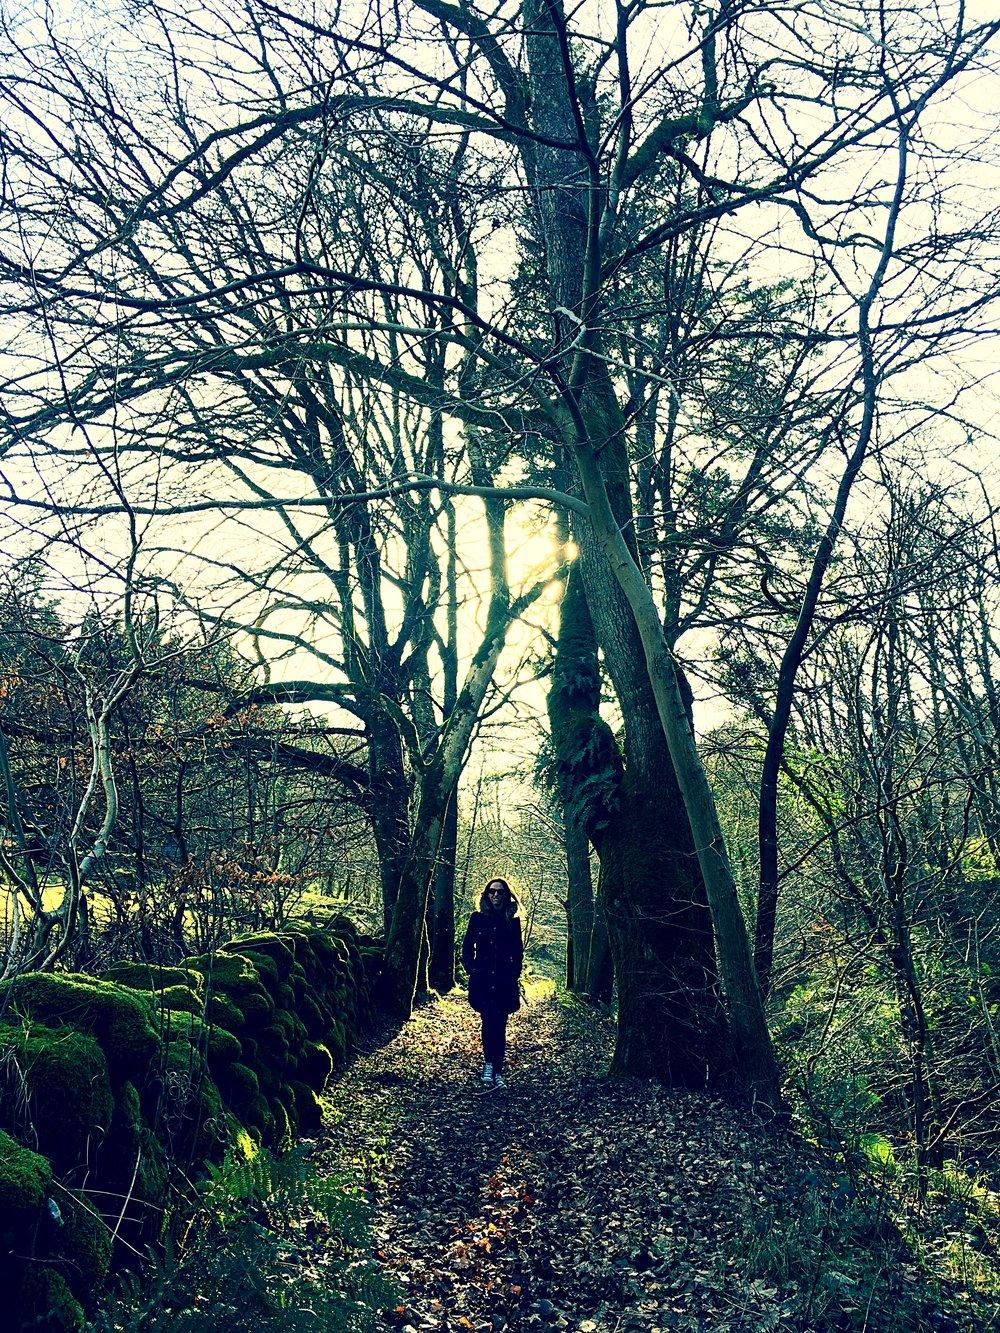 silhouette_forest_glenariff_glenoe_glenarm_glens_antrim_ni_explorer_niexplorer_northern_ireland_blog.jpg